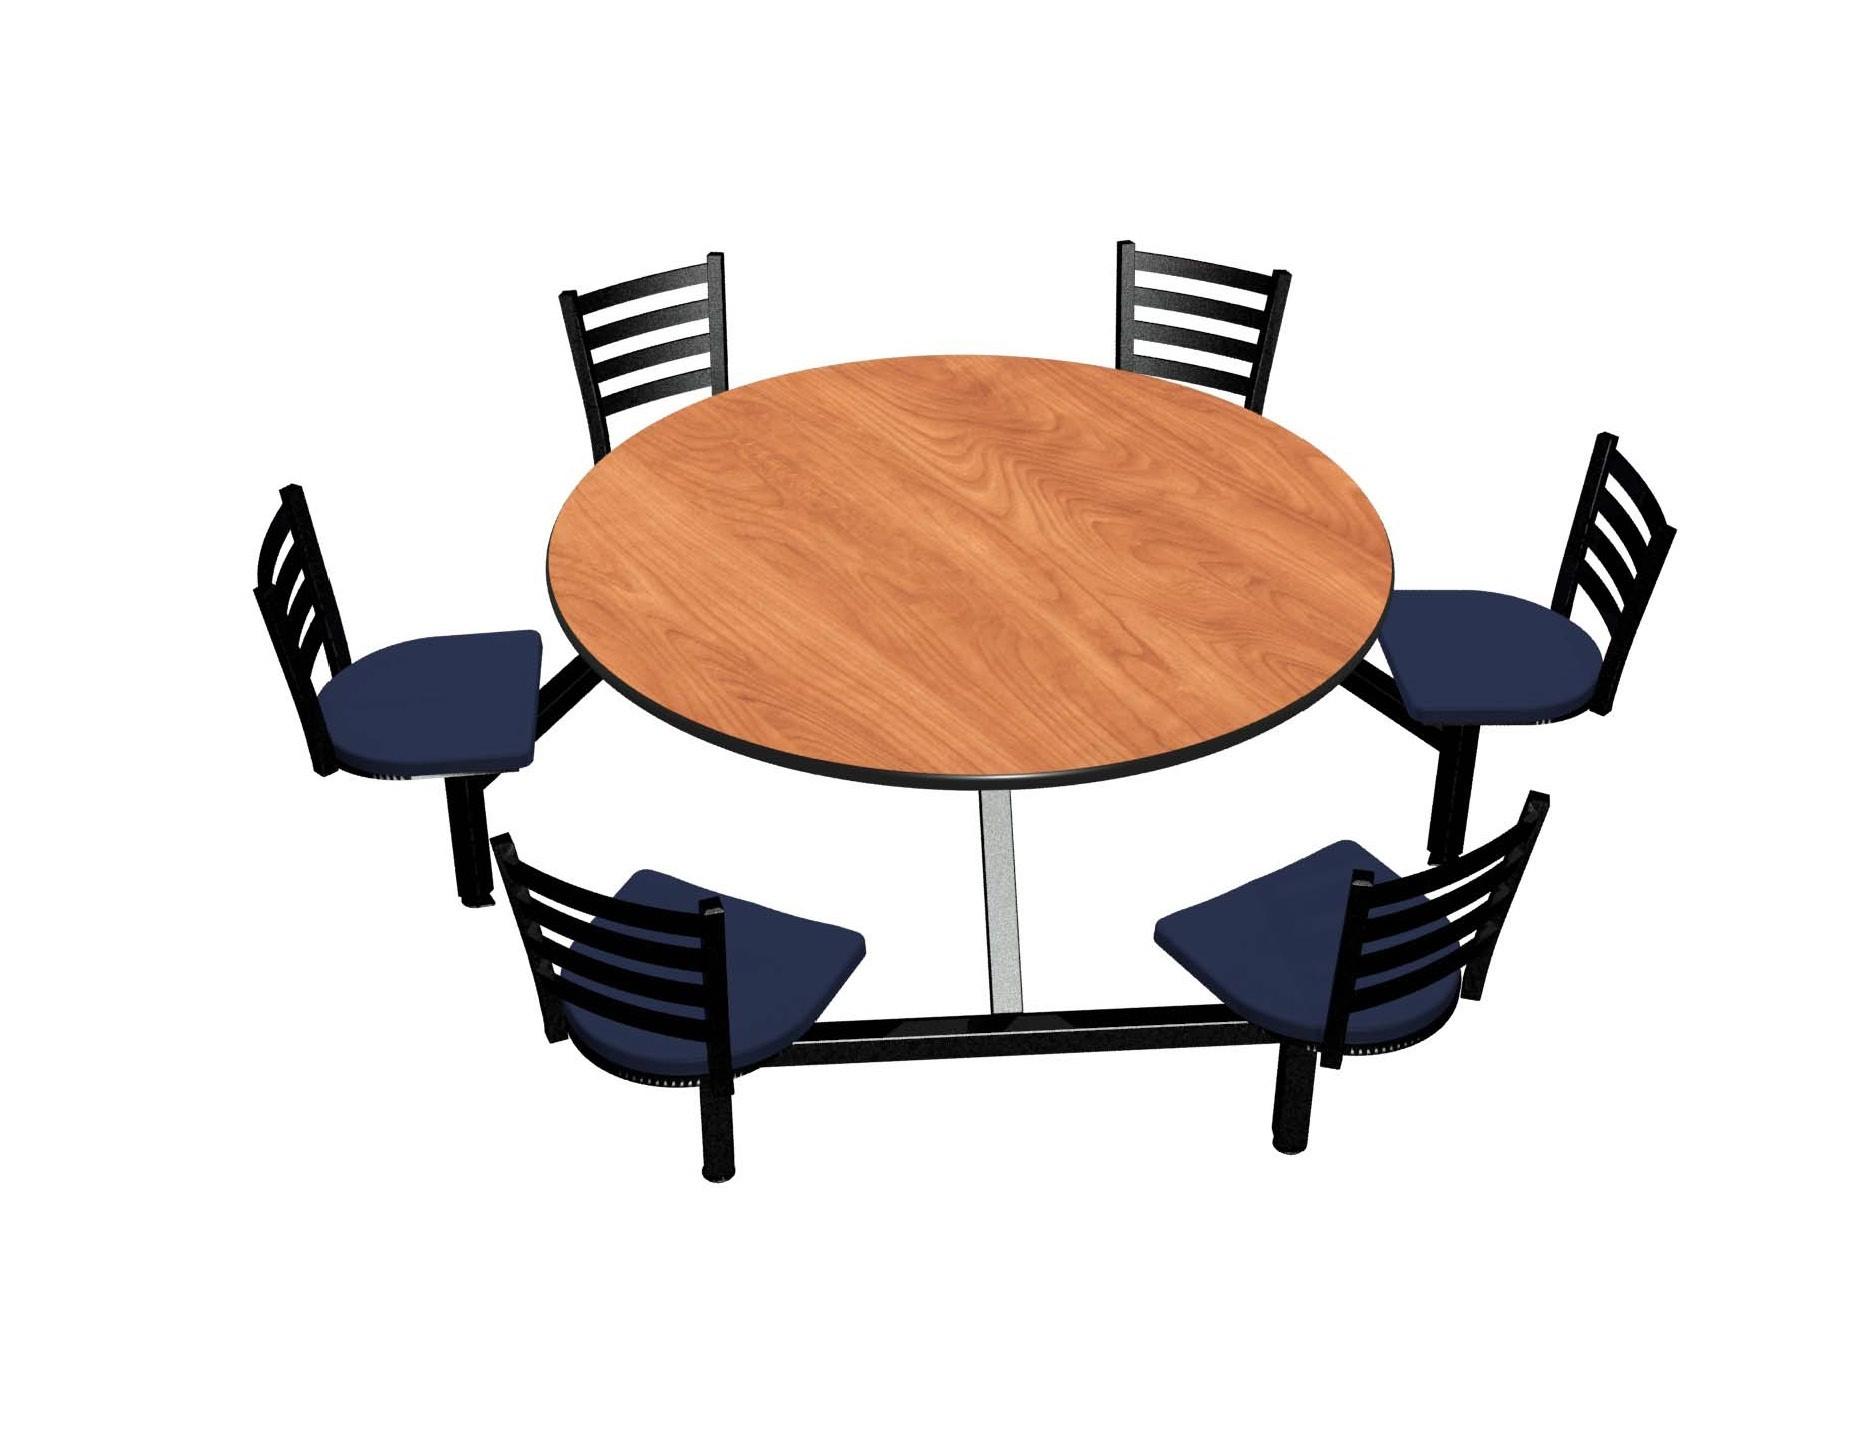 Wild Cherry laminate table, Black vinyl edge, Latitude chairhead with Bluejay seat